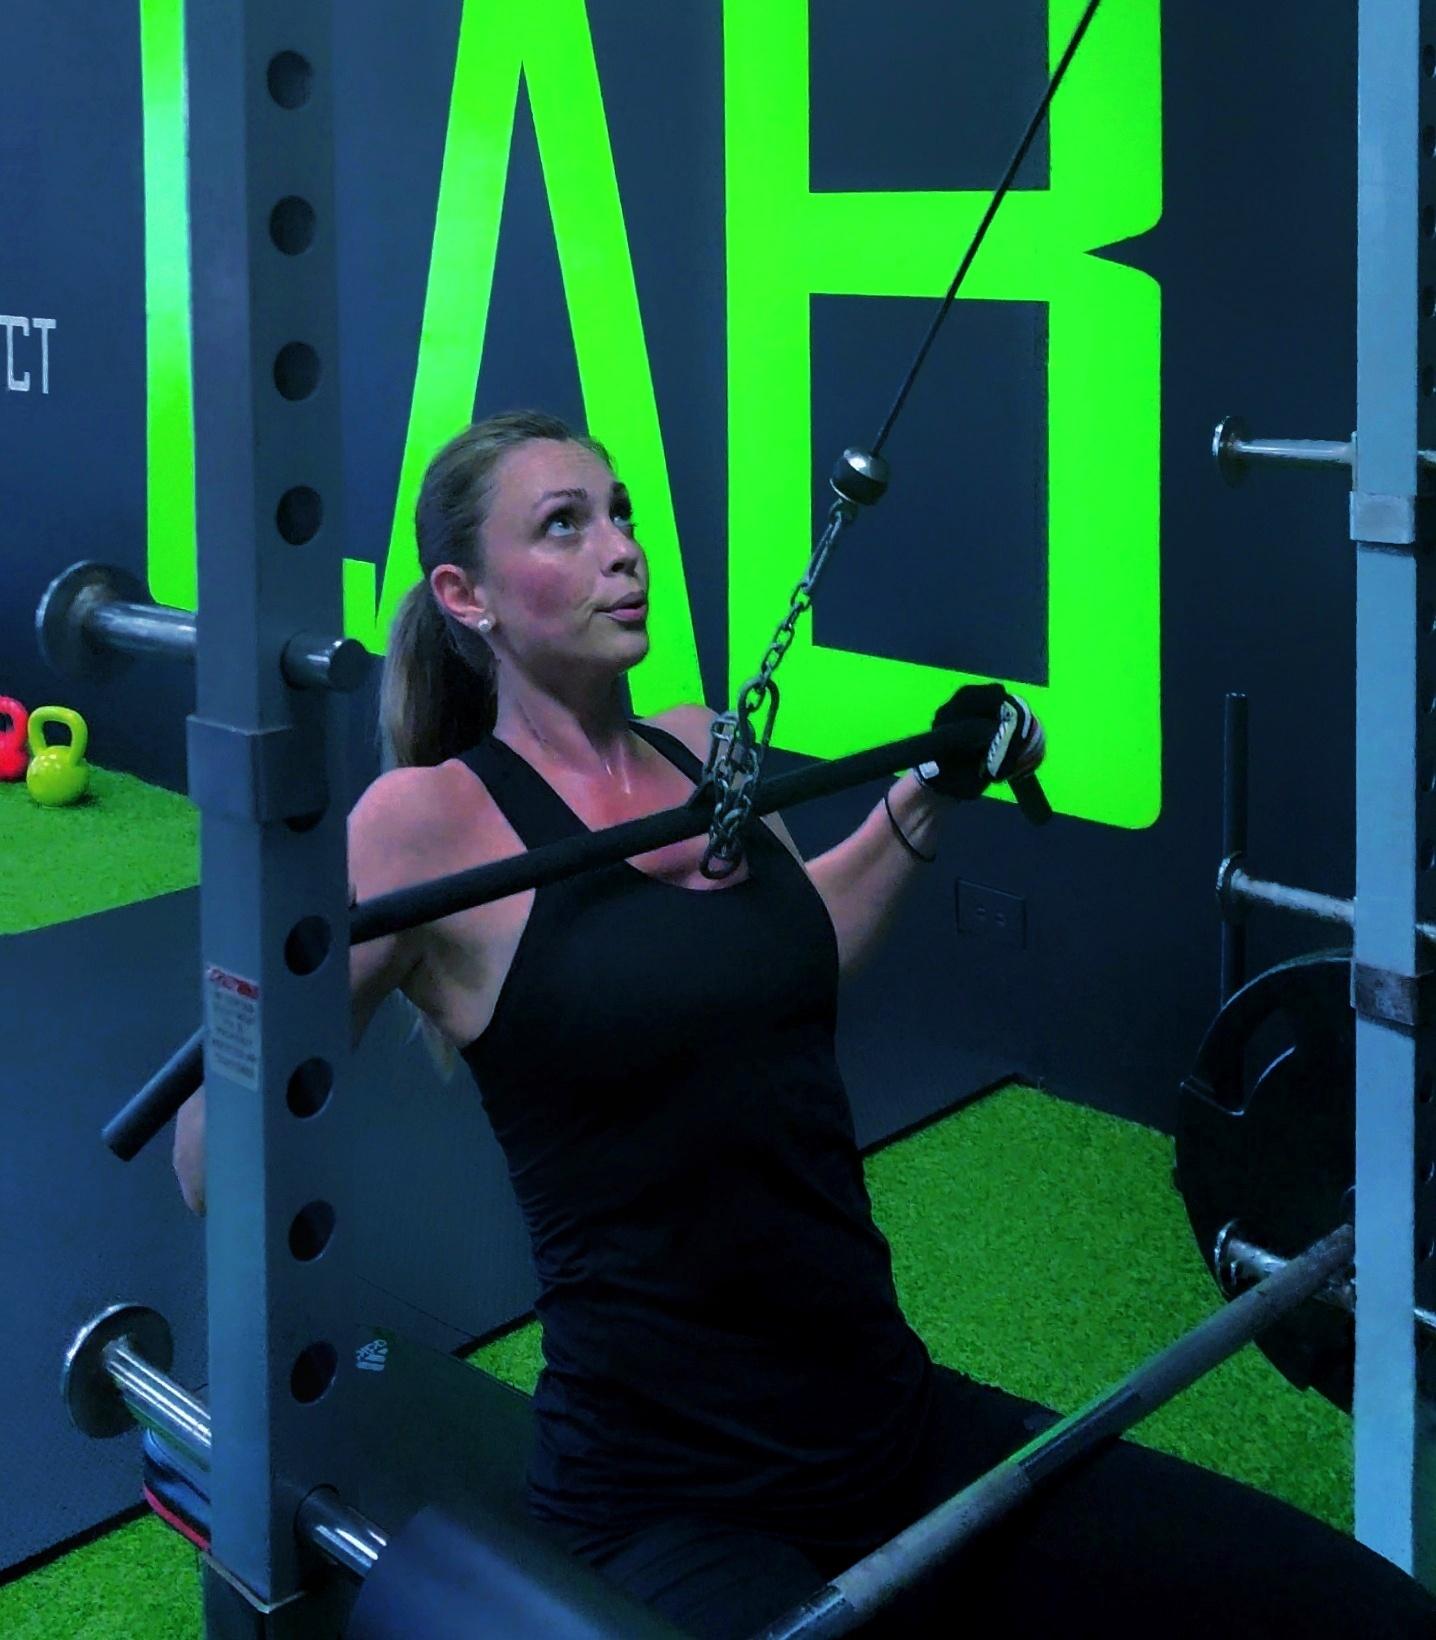 proeffect fitness, proeffect personal training, Dan Mladenovic, Personal Training Torrance, ProEffec